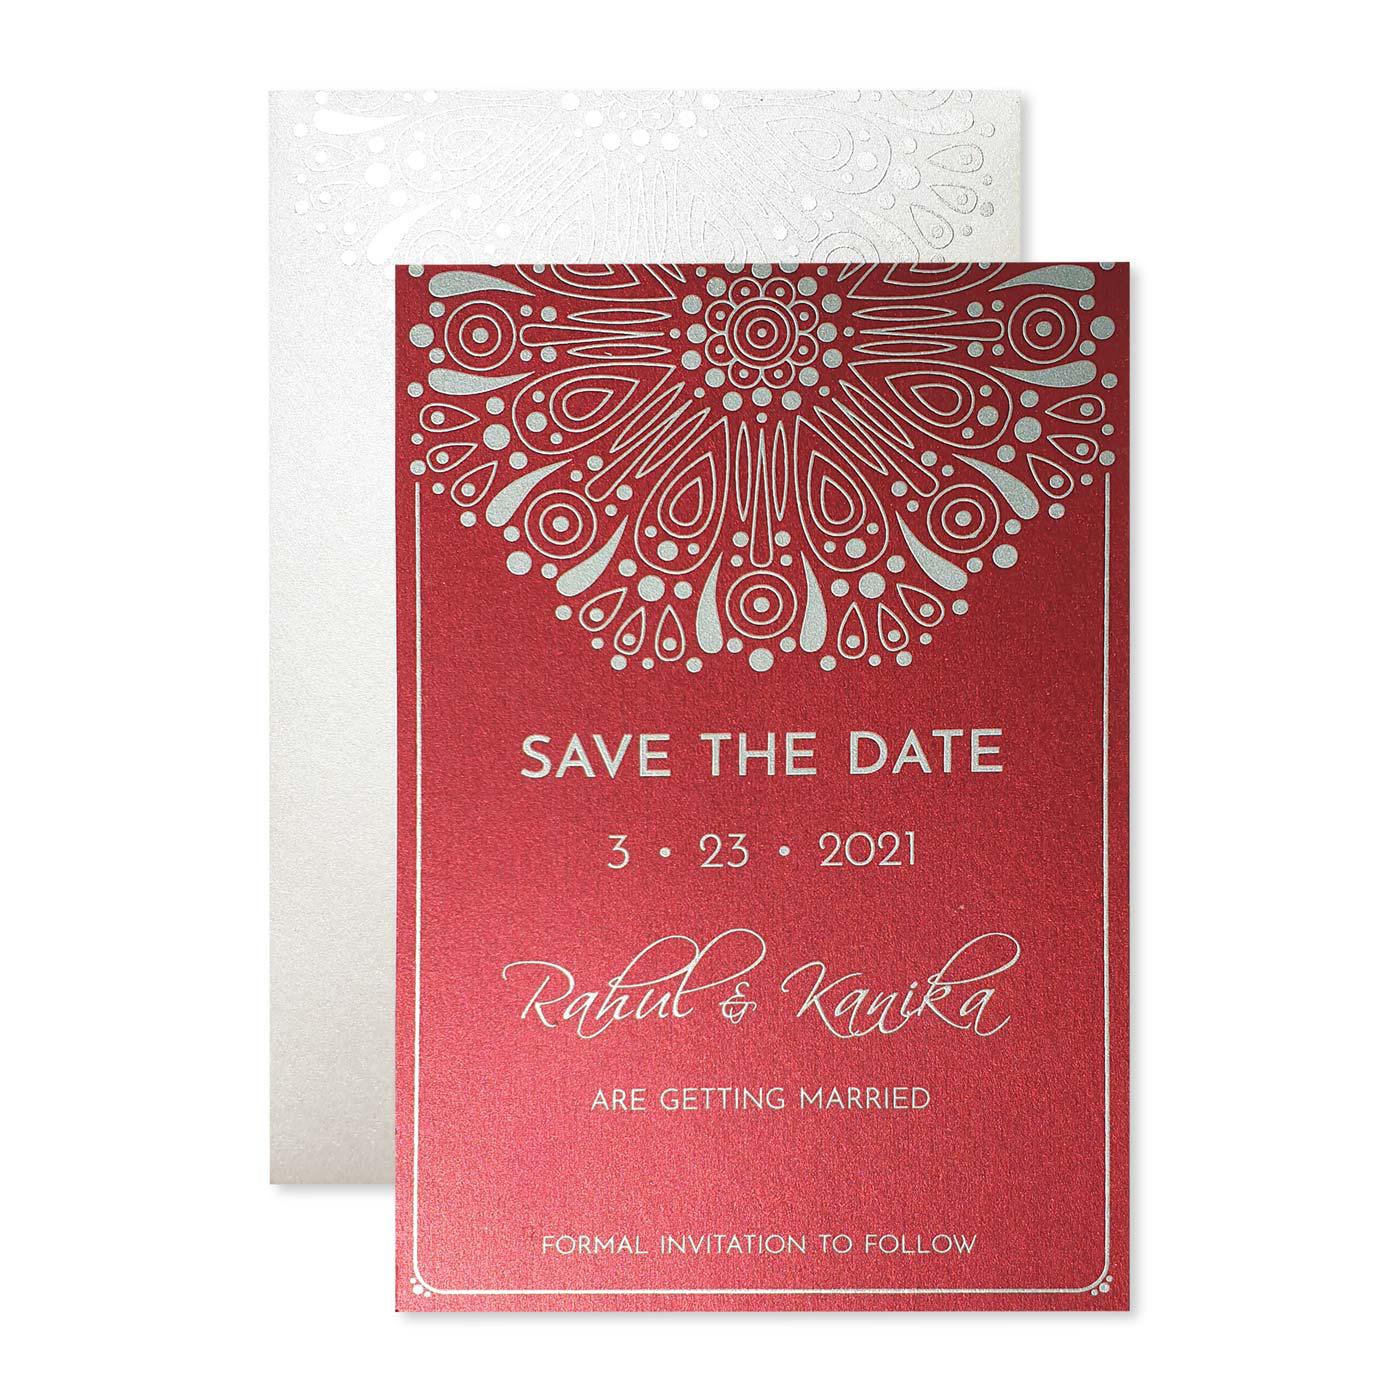 Save The Date Cards : STD-CHERRY_CRUSH - 123WeddingCards